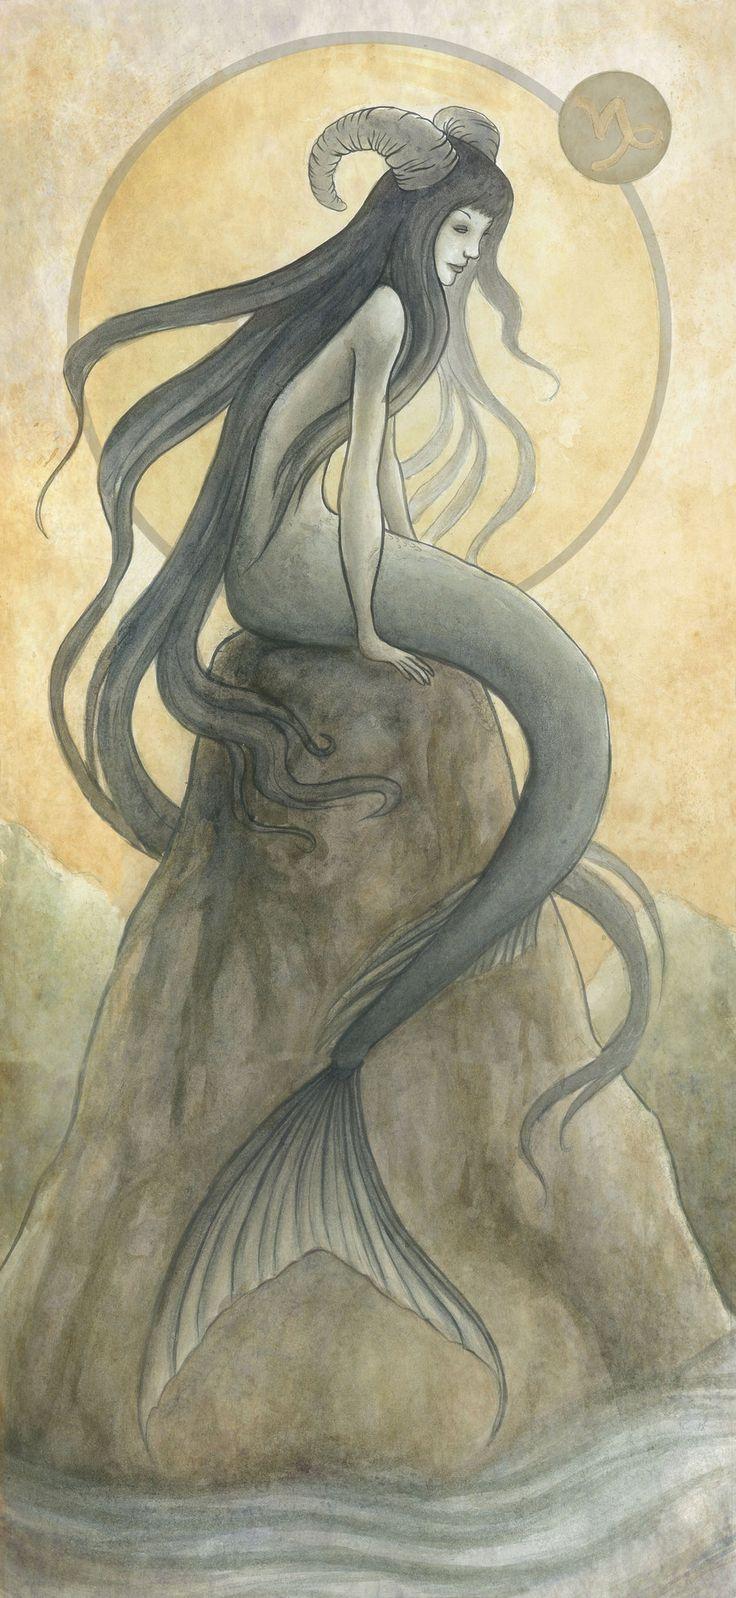 AstroSpirit / Capricorn ♑ / Earth / Capricorne / The Sea Goat by ~Evanira